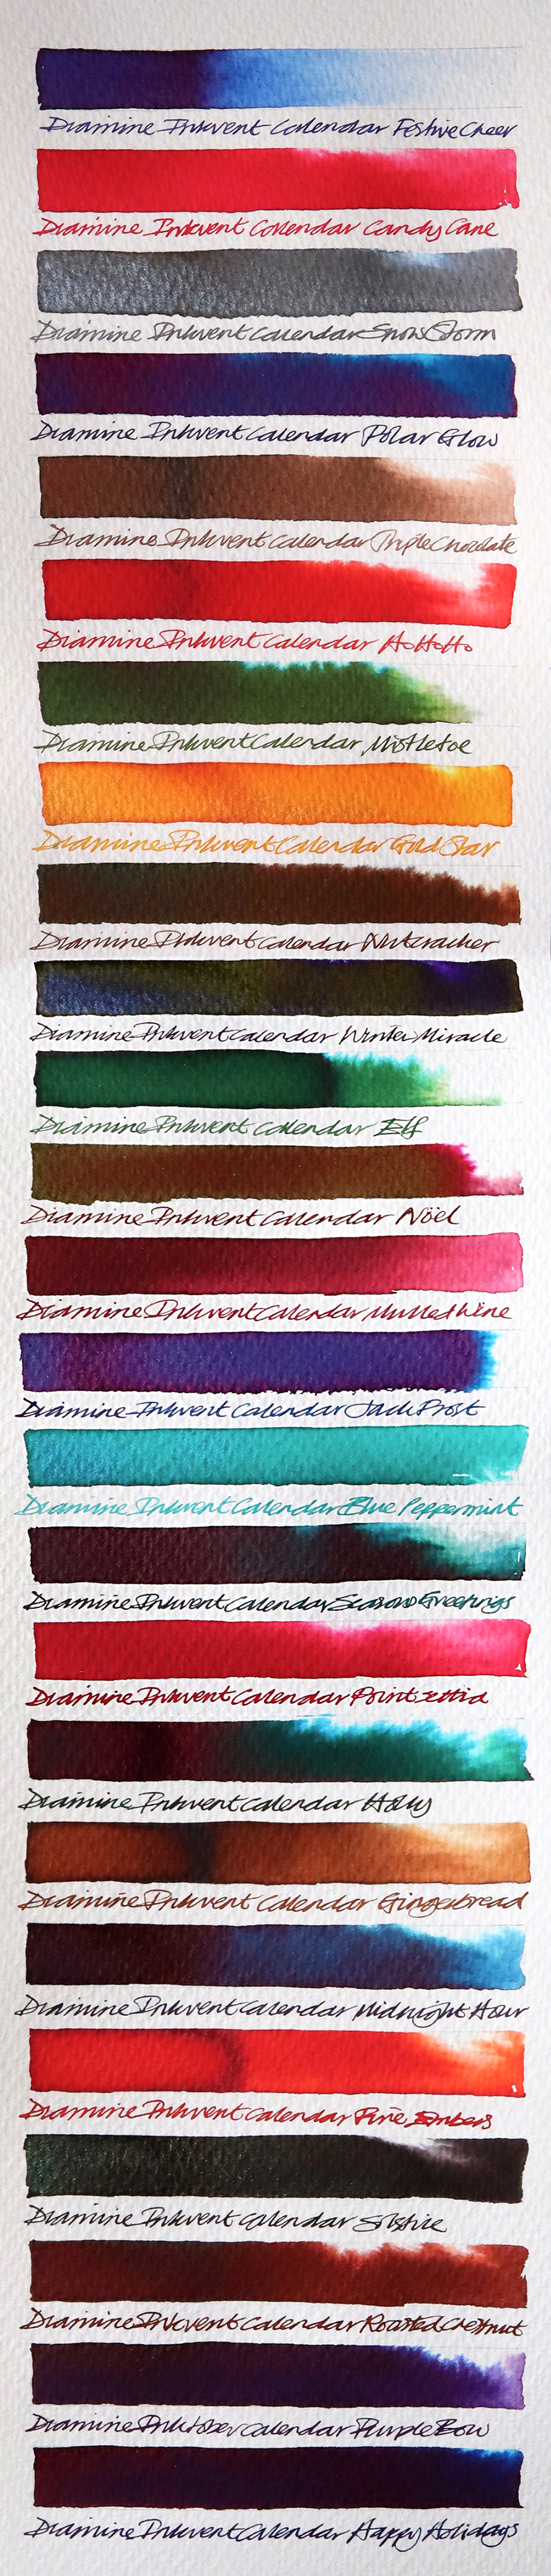 ink-chart.jpg